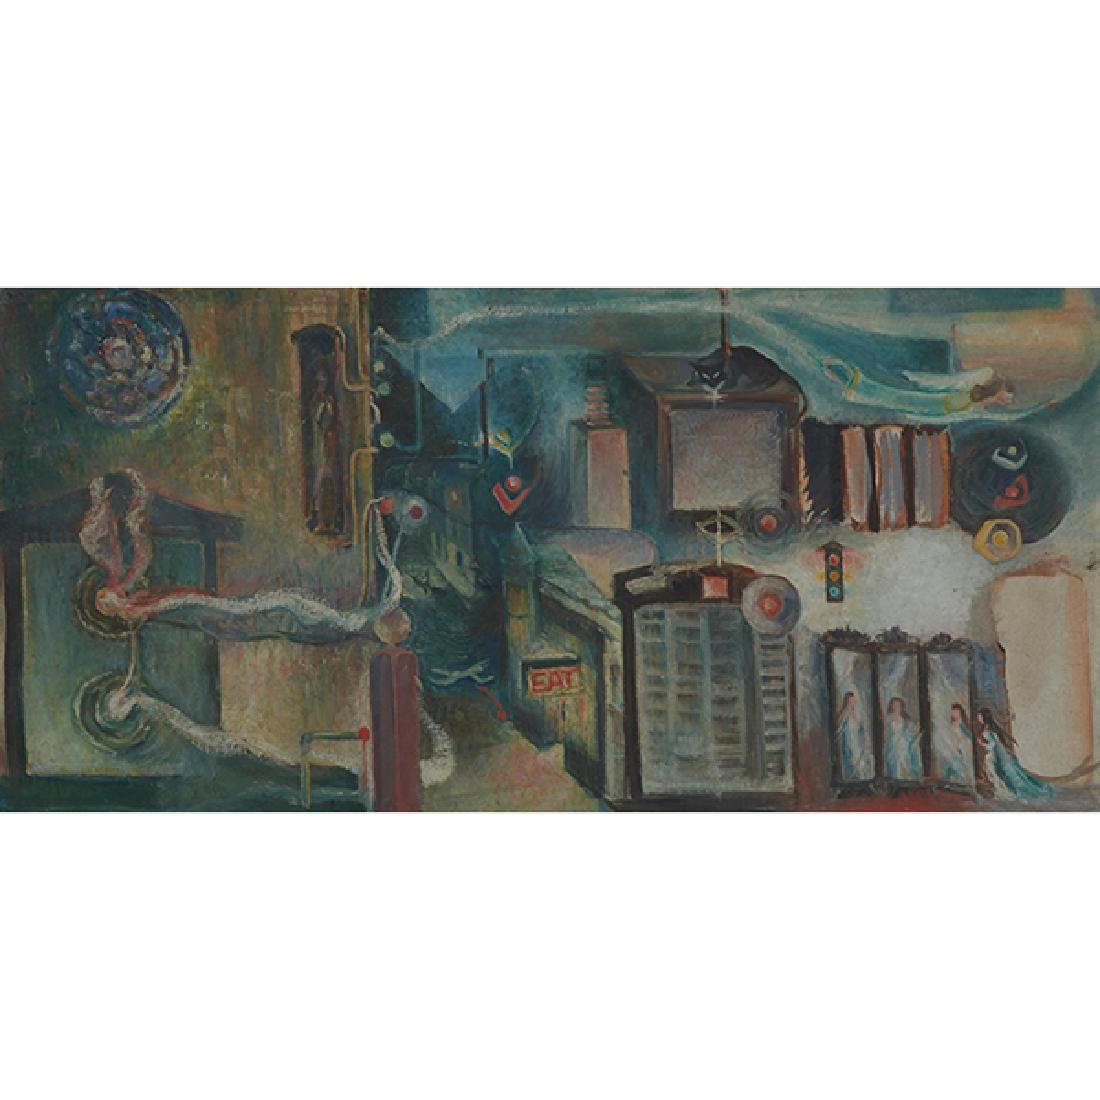 Artist Unknown , (20th century), Surreal City Scene,